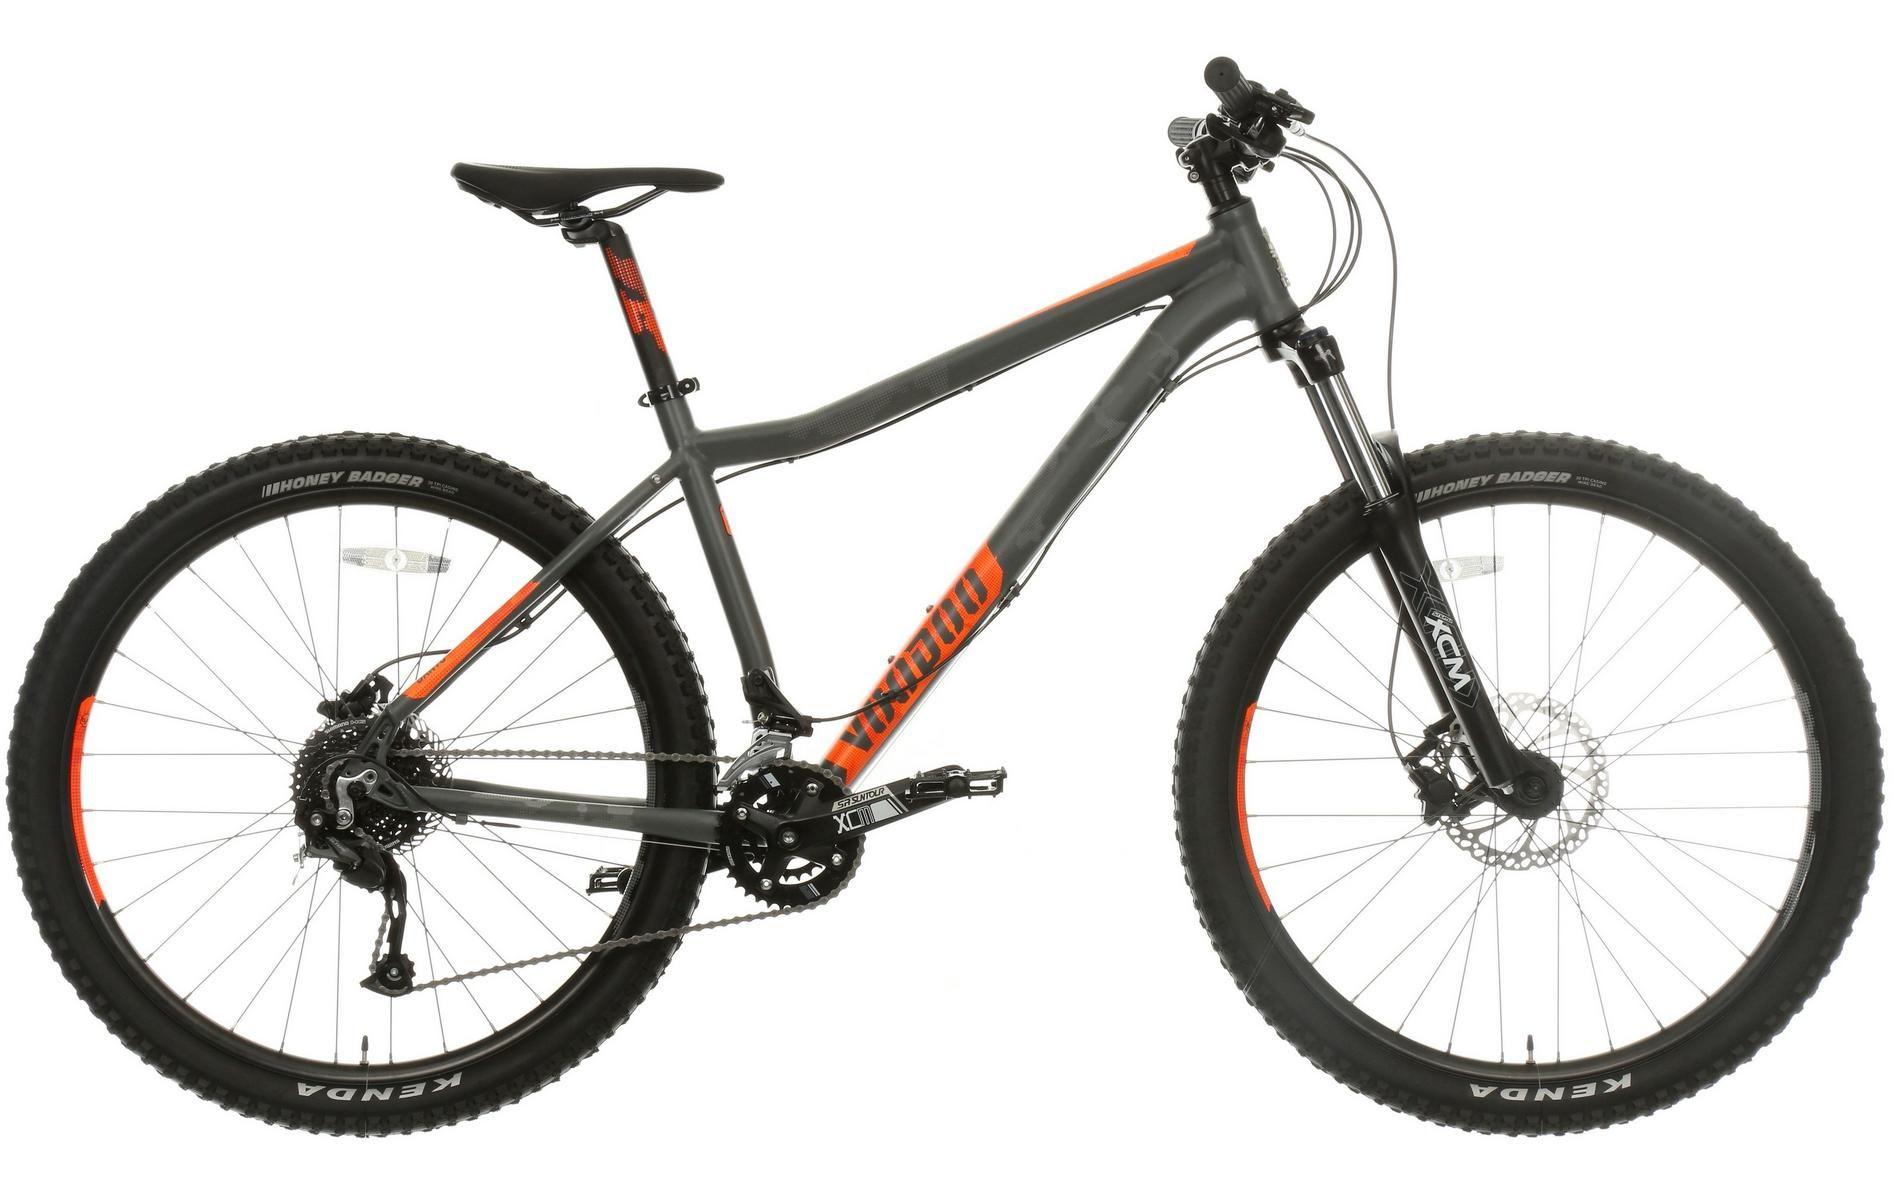 Voodoo Bantu Men's Mountain Bike - £370 @ Halfords